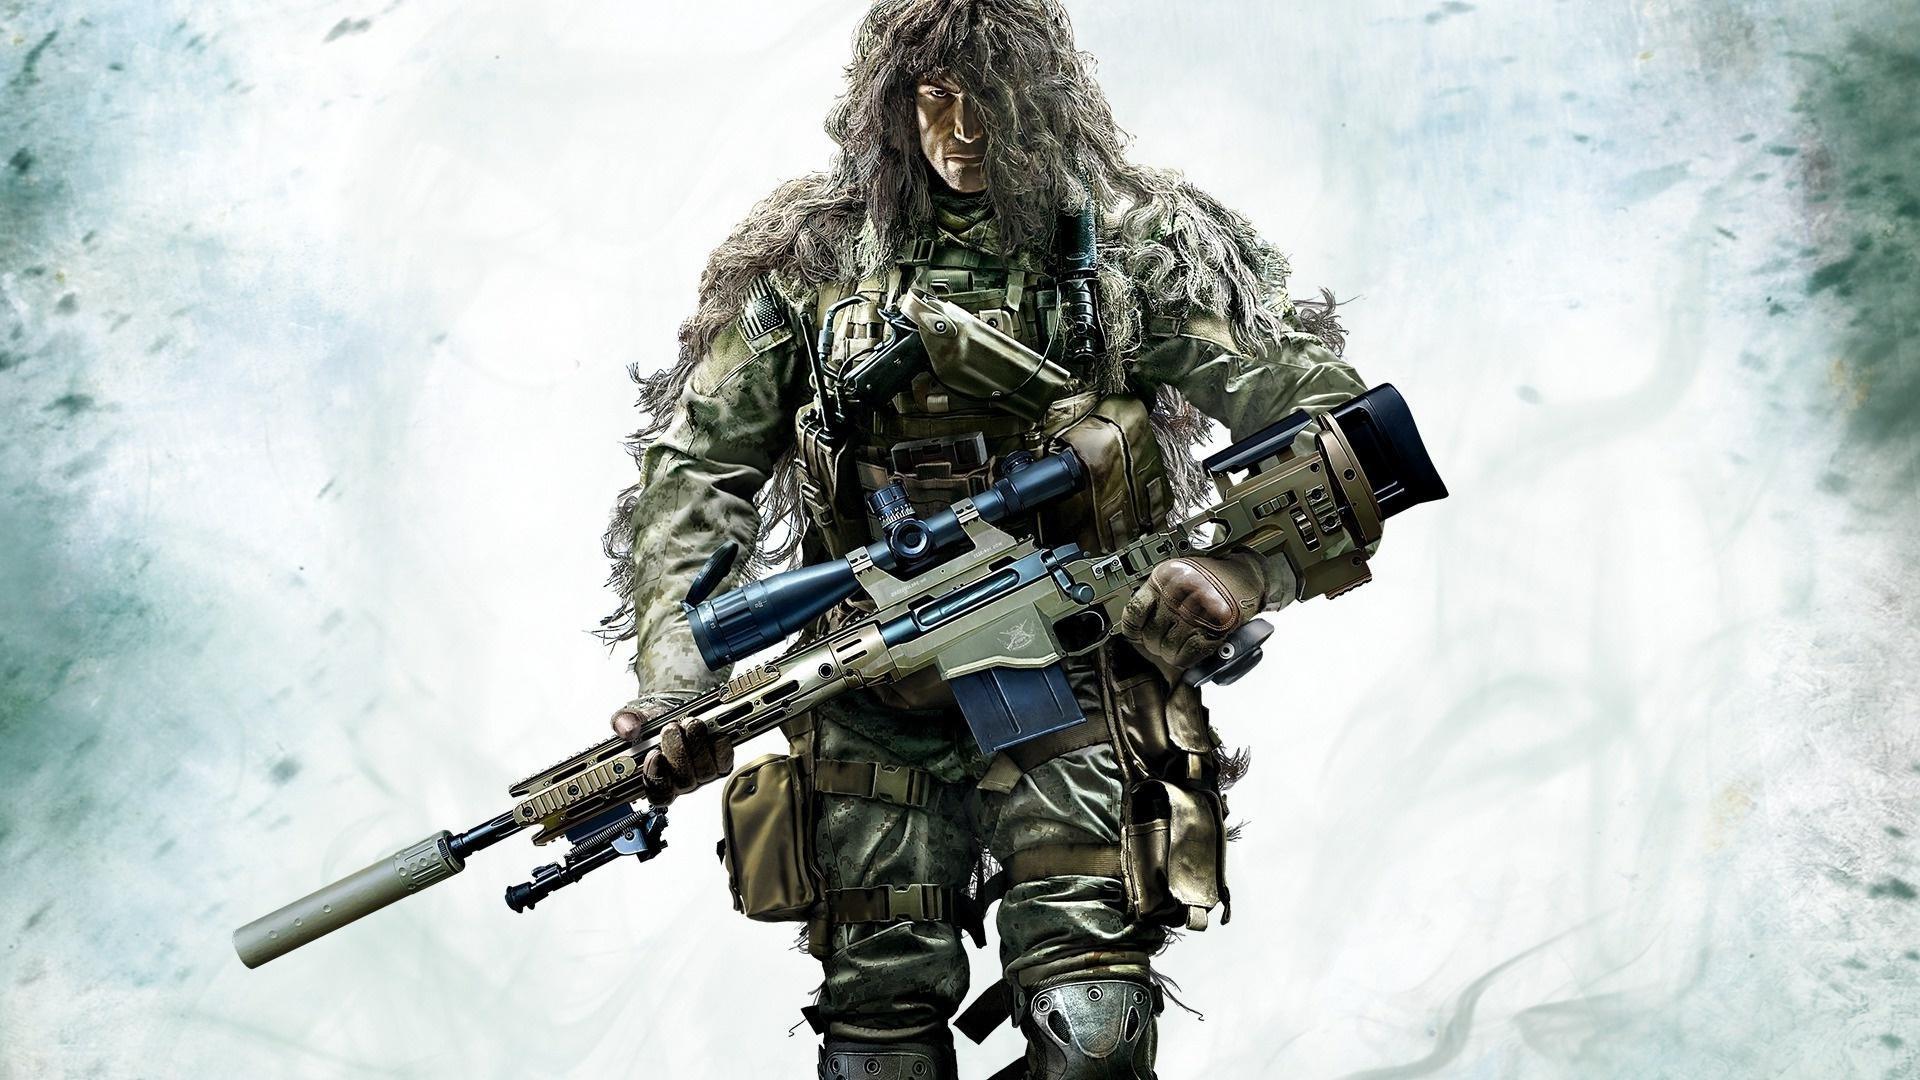 Numero de serie de sniper ghost warrior pc